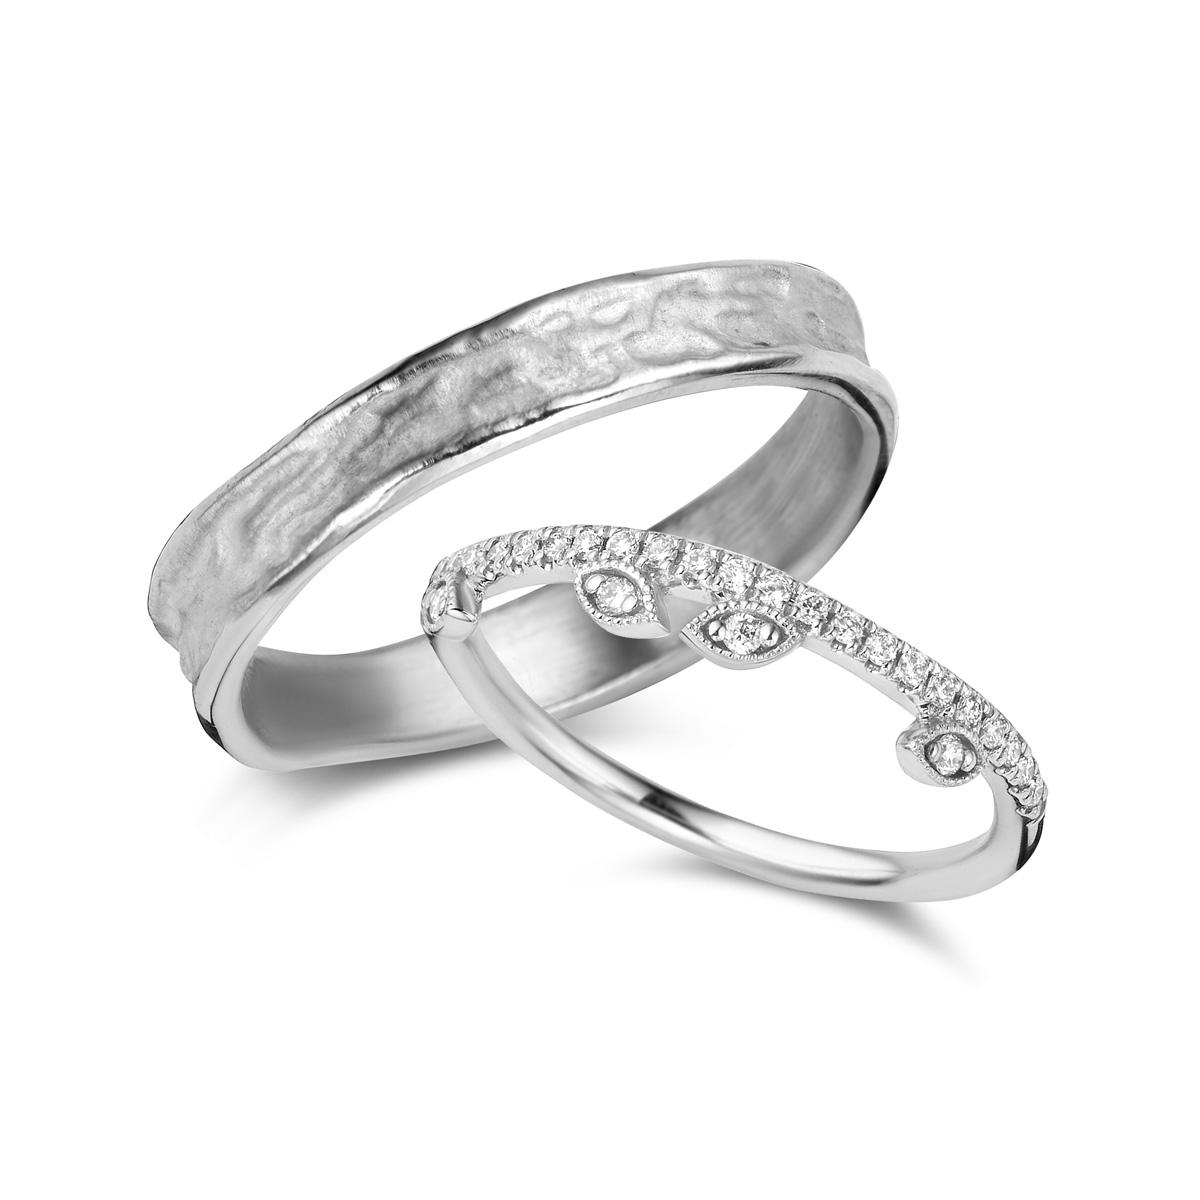 De Bruyloft trouwringen: B-RM182190-TW005H_W7